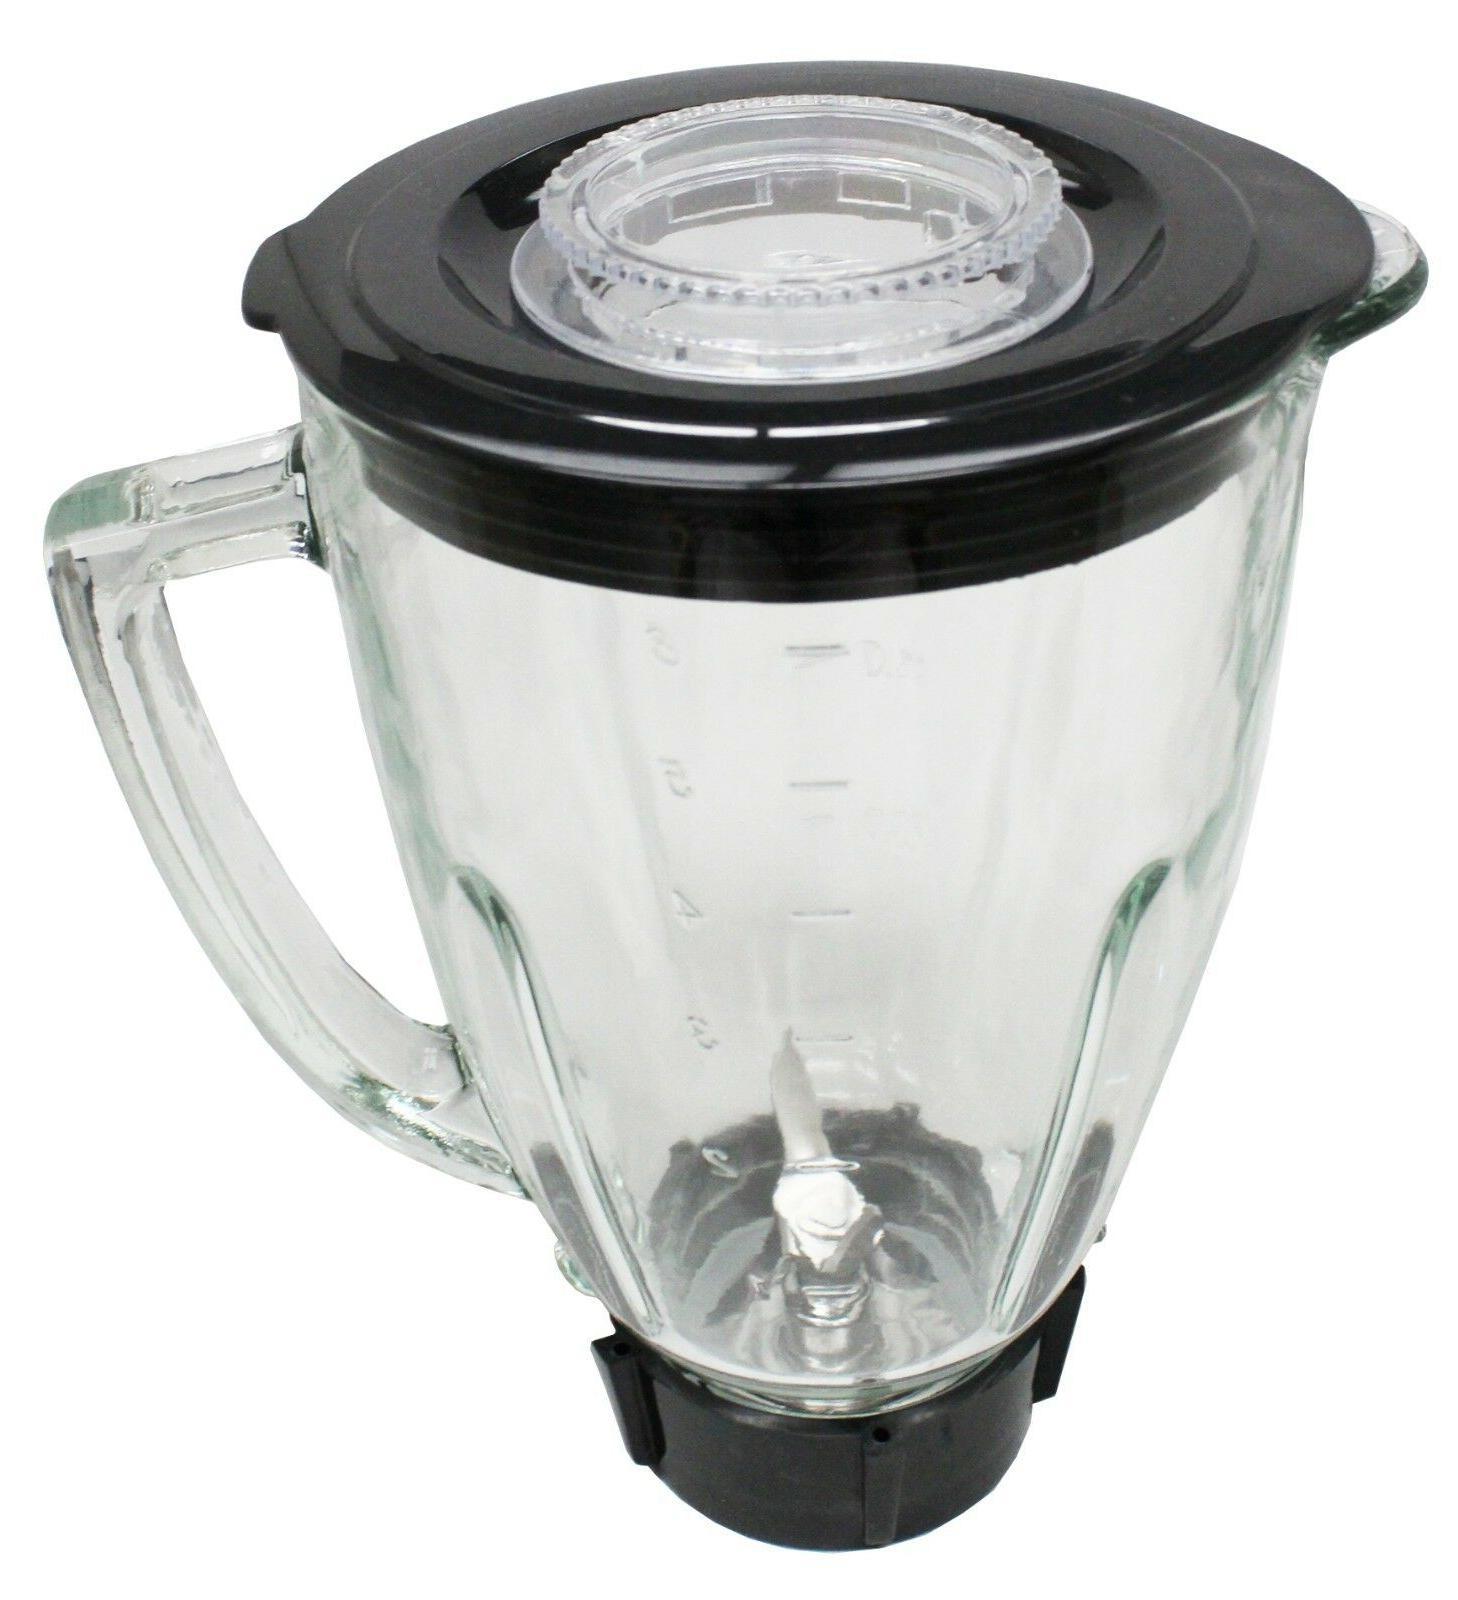 Ronnel Collection 6 Piece Round Blender Glass Jar Replacemen